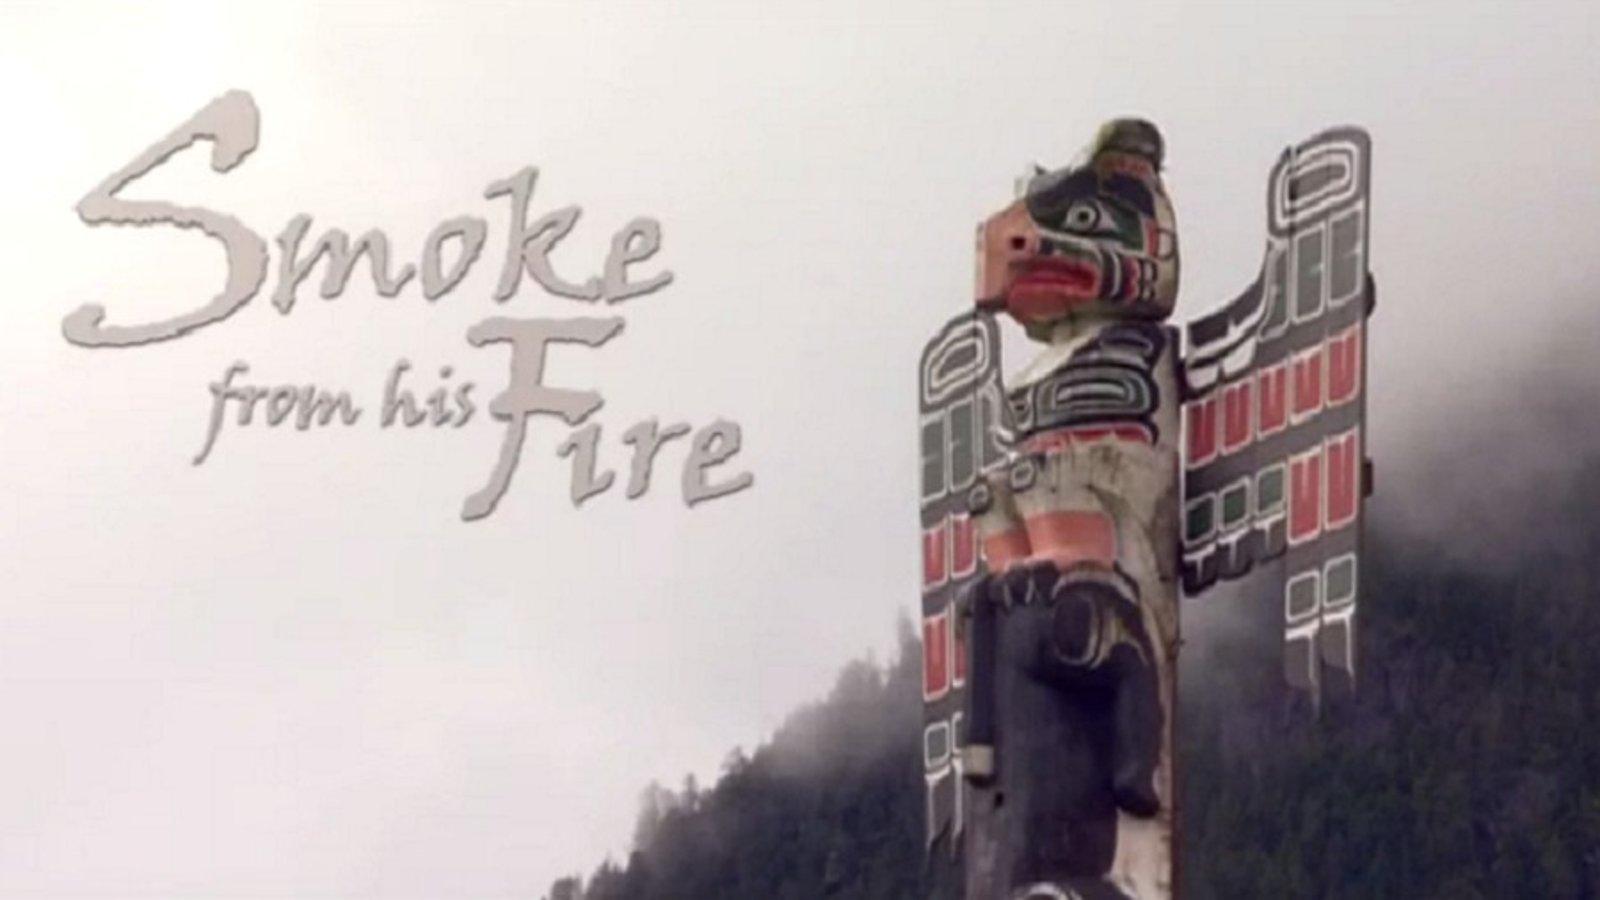 Smoke from His Fire - The Kwakwaka'wakw of the Pacific Northwest Coast